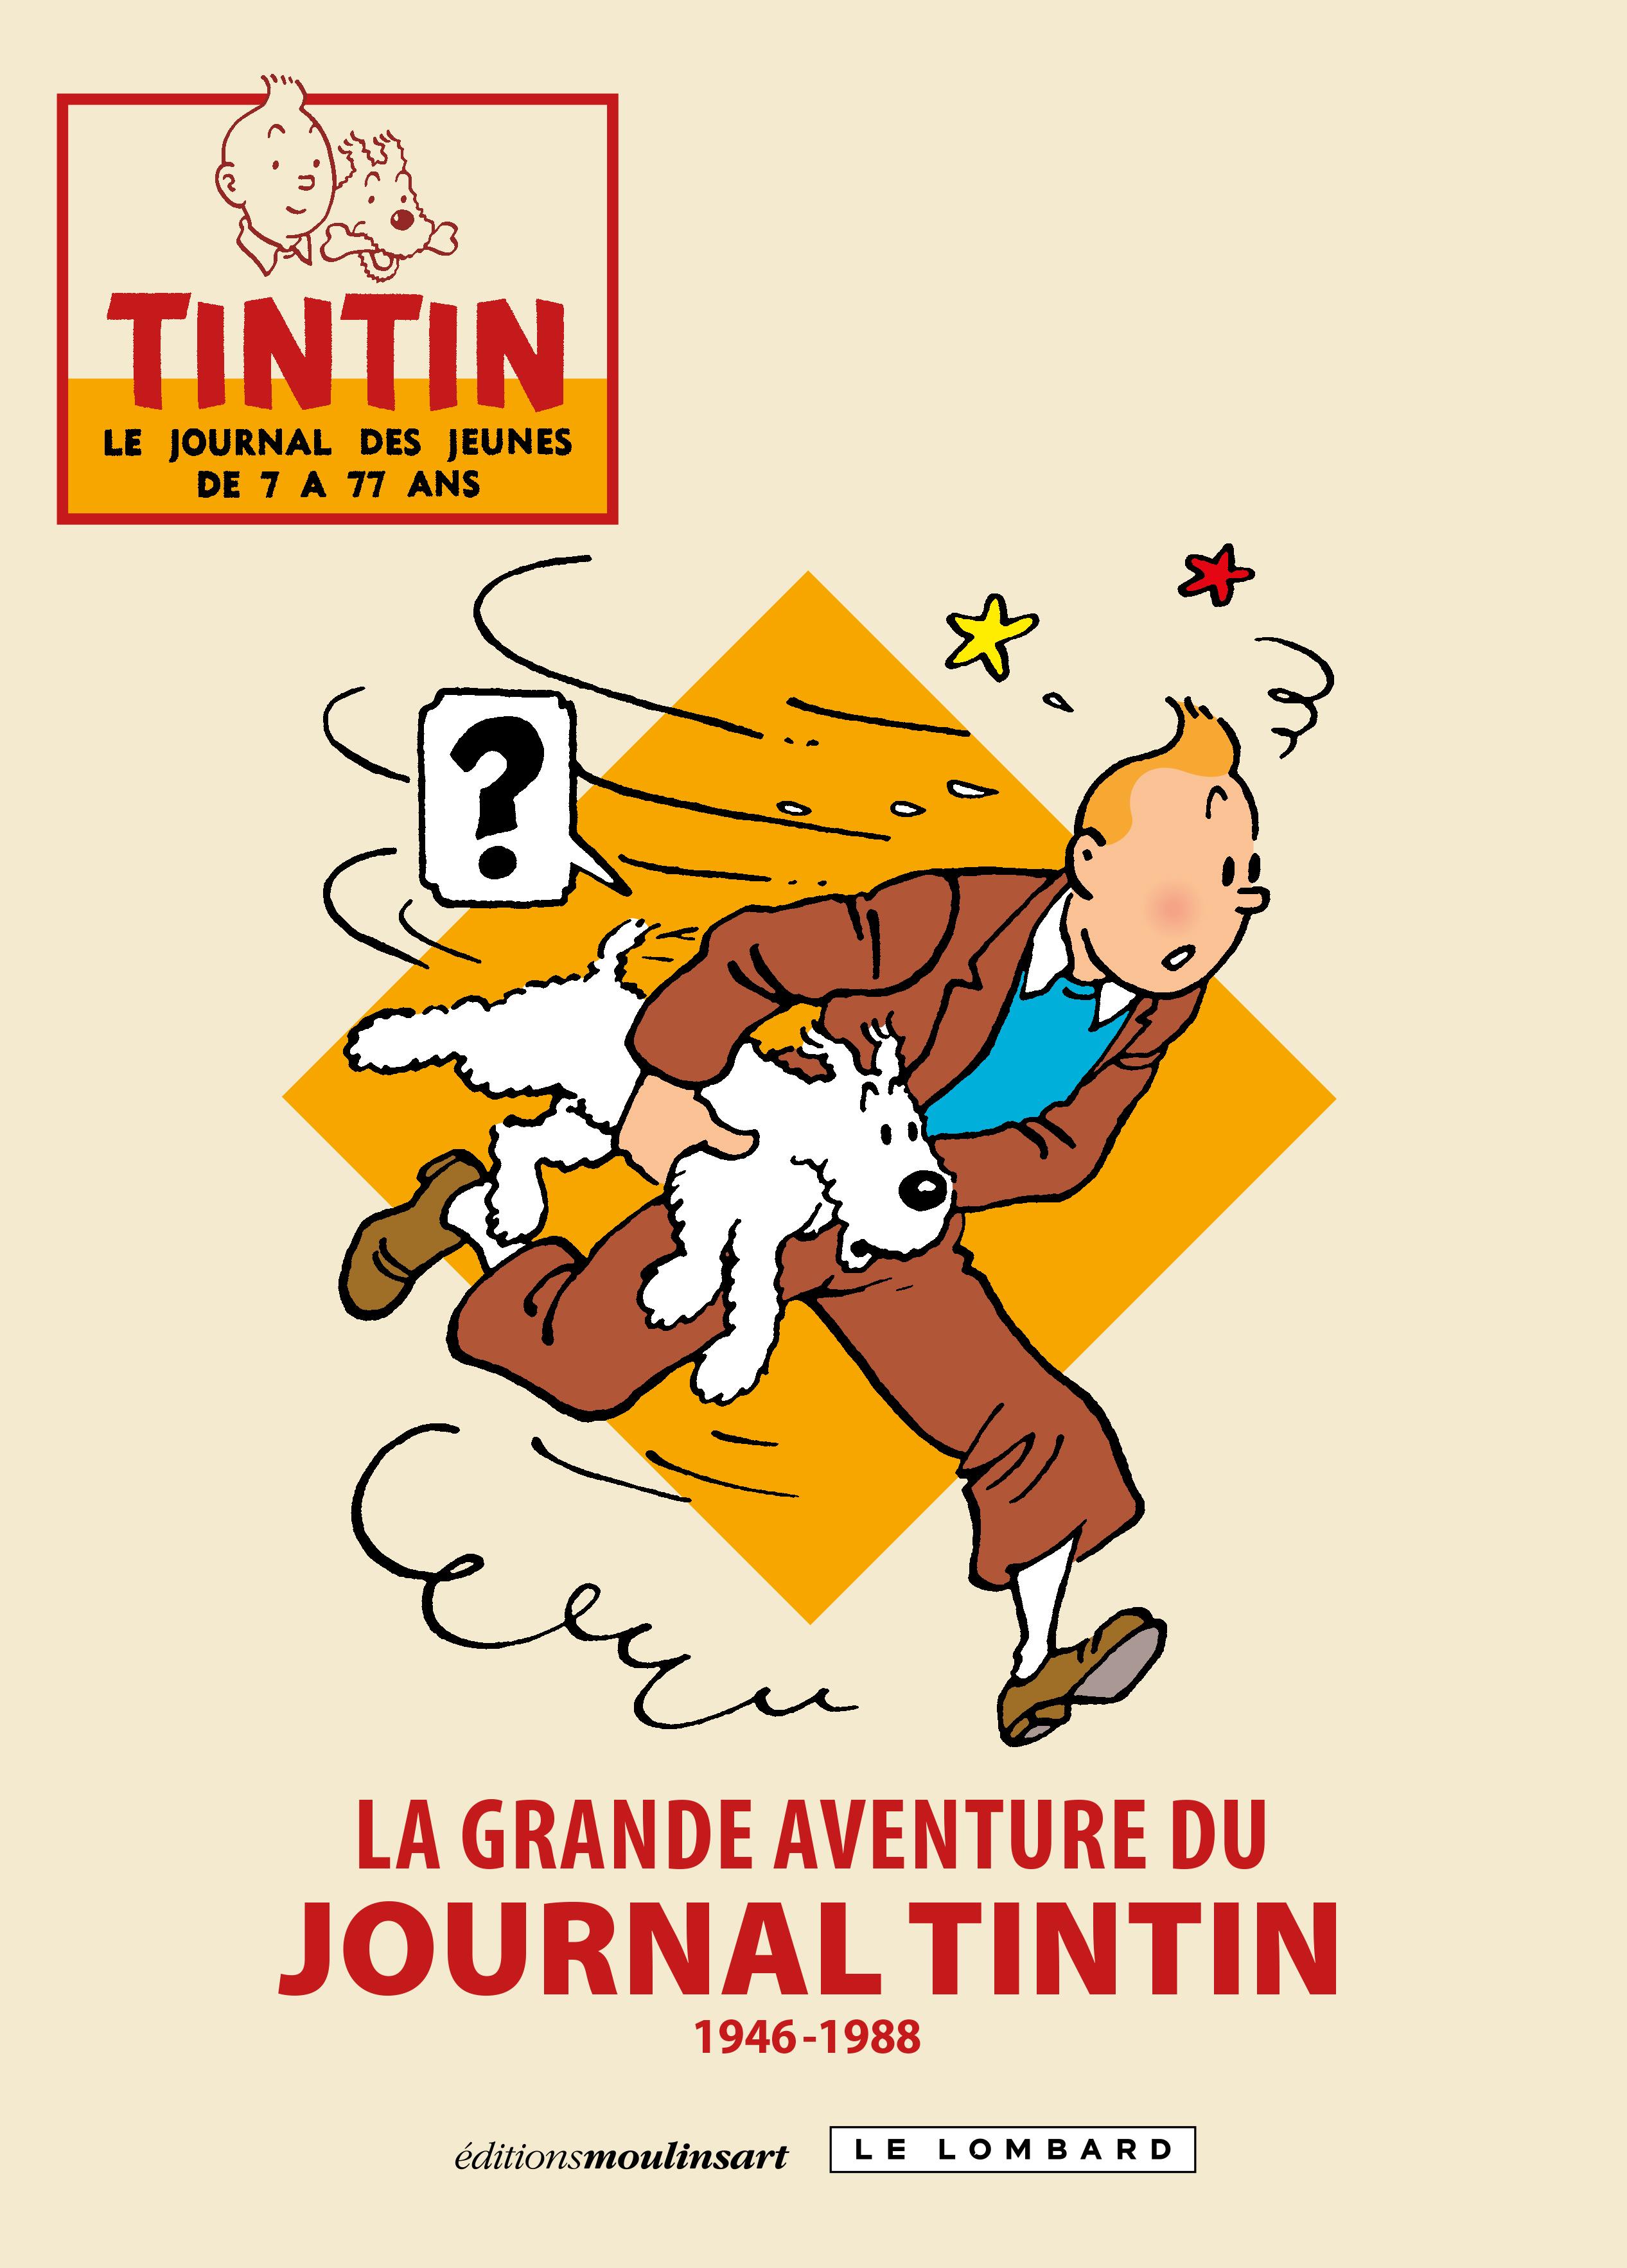 GRANDE AVENTURE JOURNAL TINTIN LA GRANDE AVENTURE DU JOURNAL TINTIN